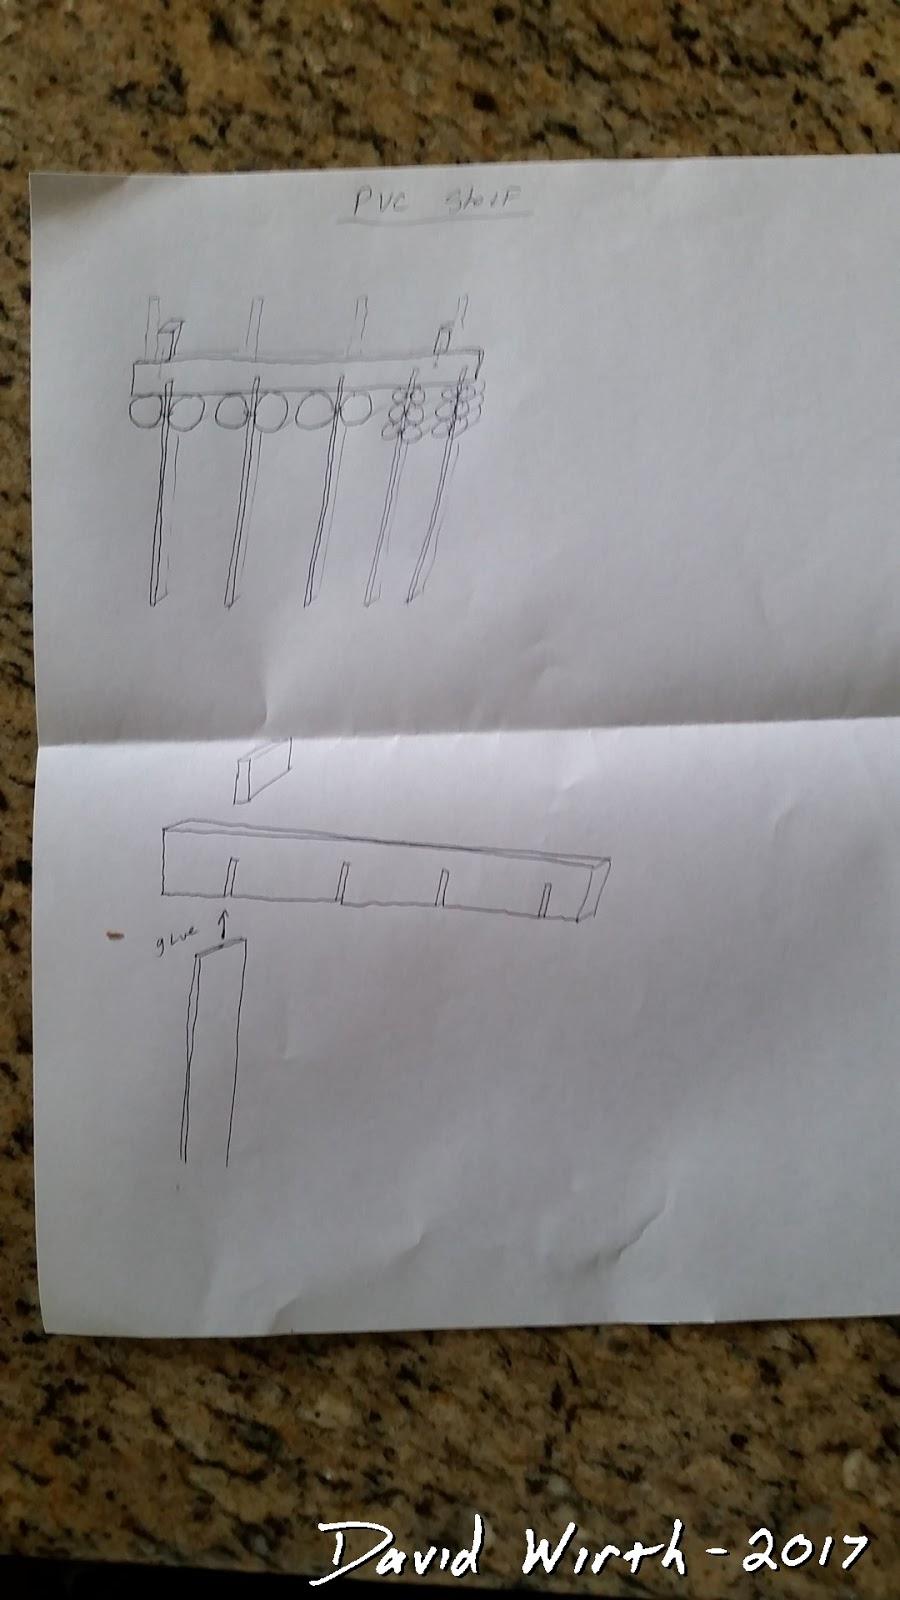 PVC Pipe Shelf - Paint Can, Glue Organize Wall Rack